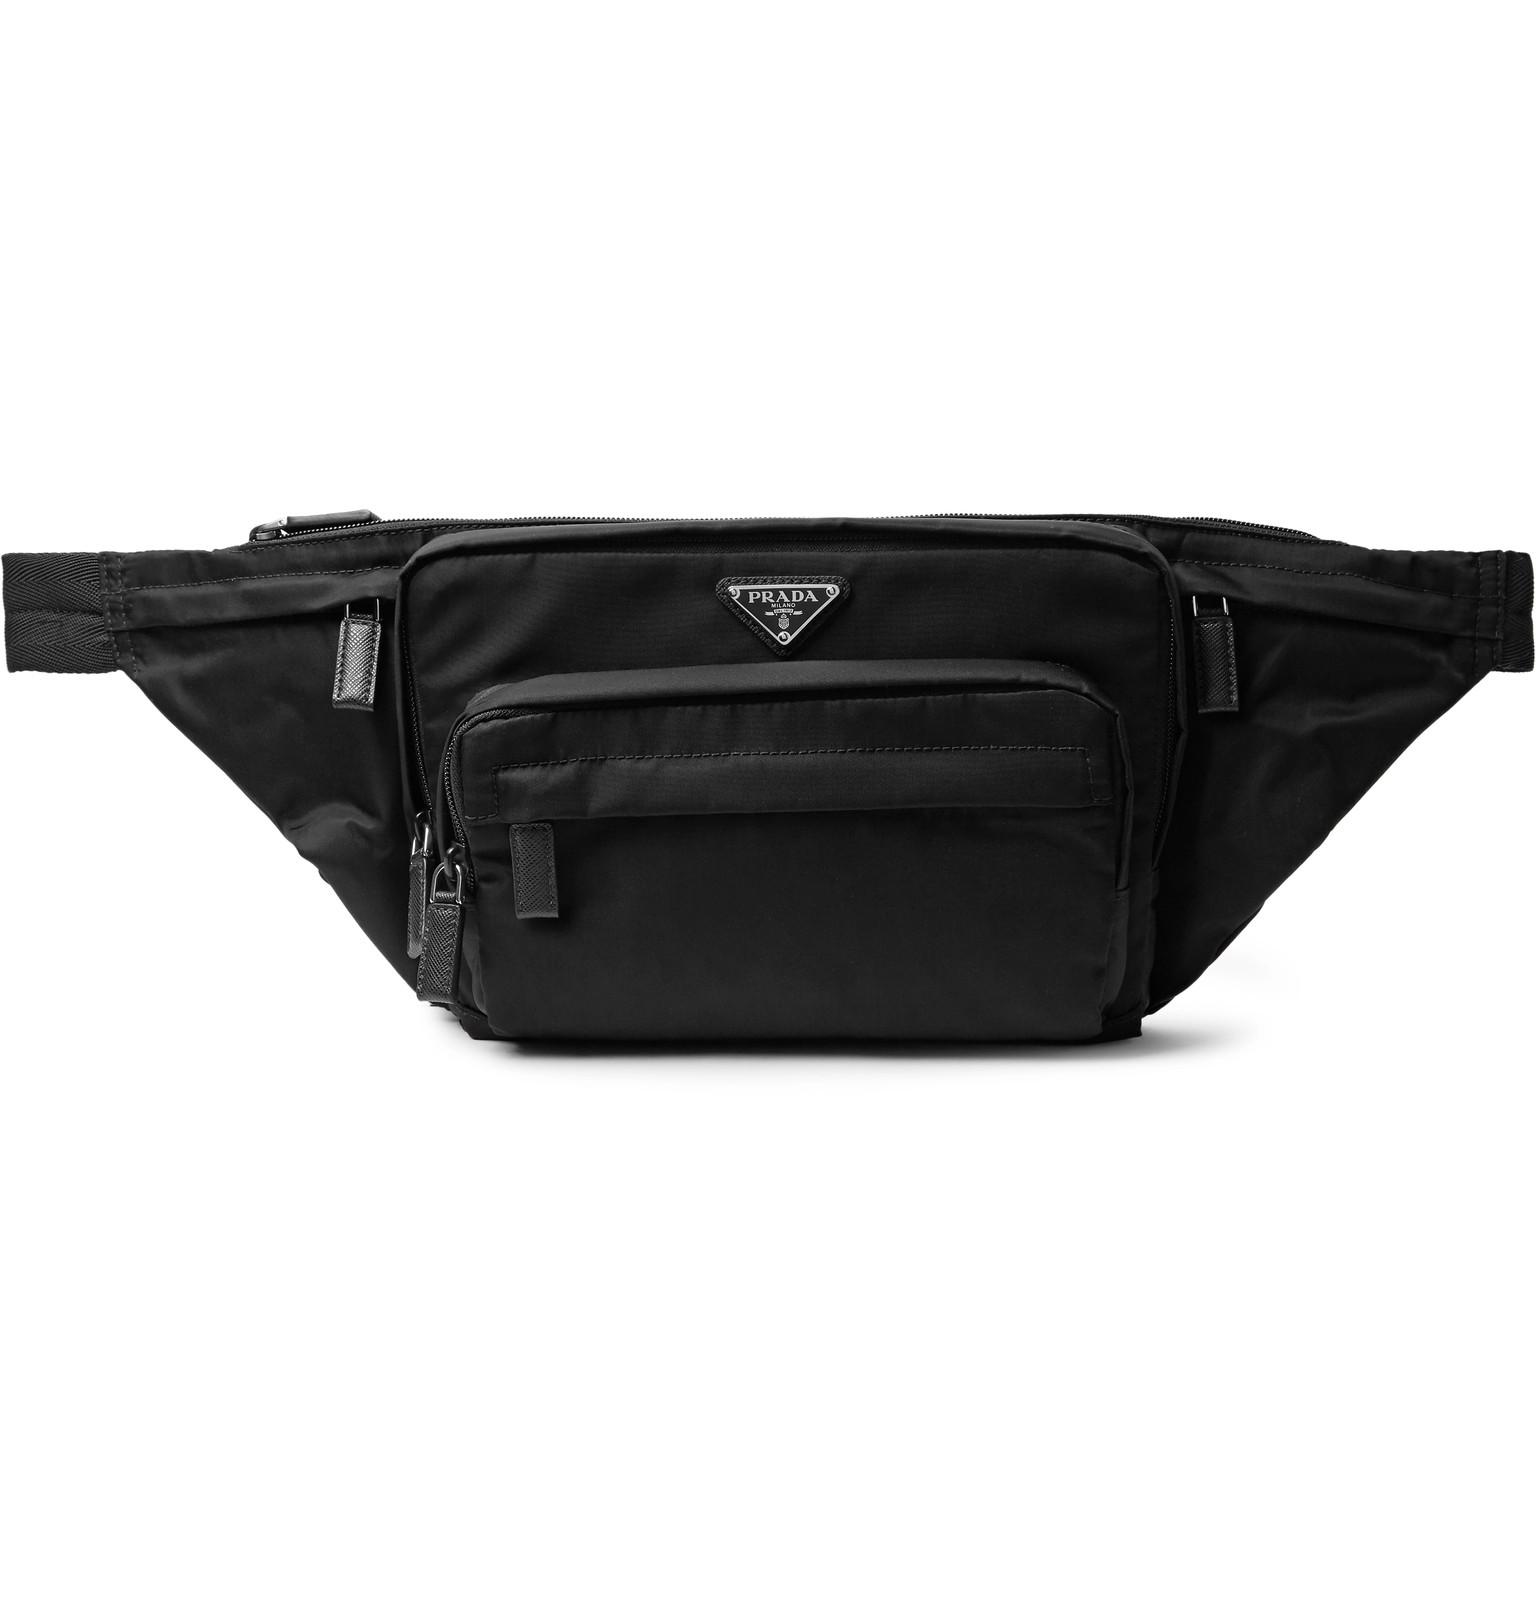 Prada - Saffiano Leather-Trimmed Nylon Belt Bag c9a248f49a